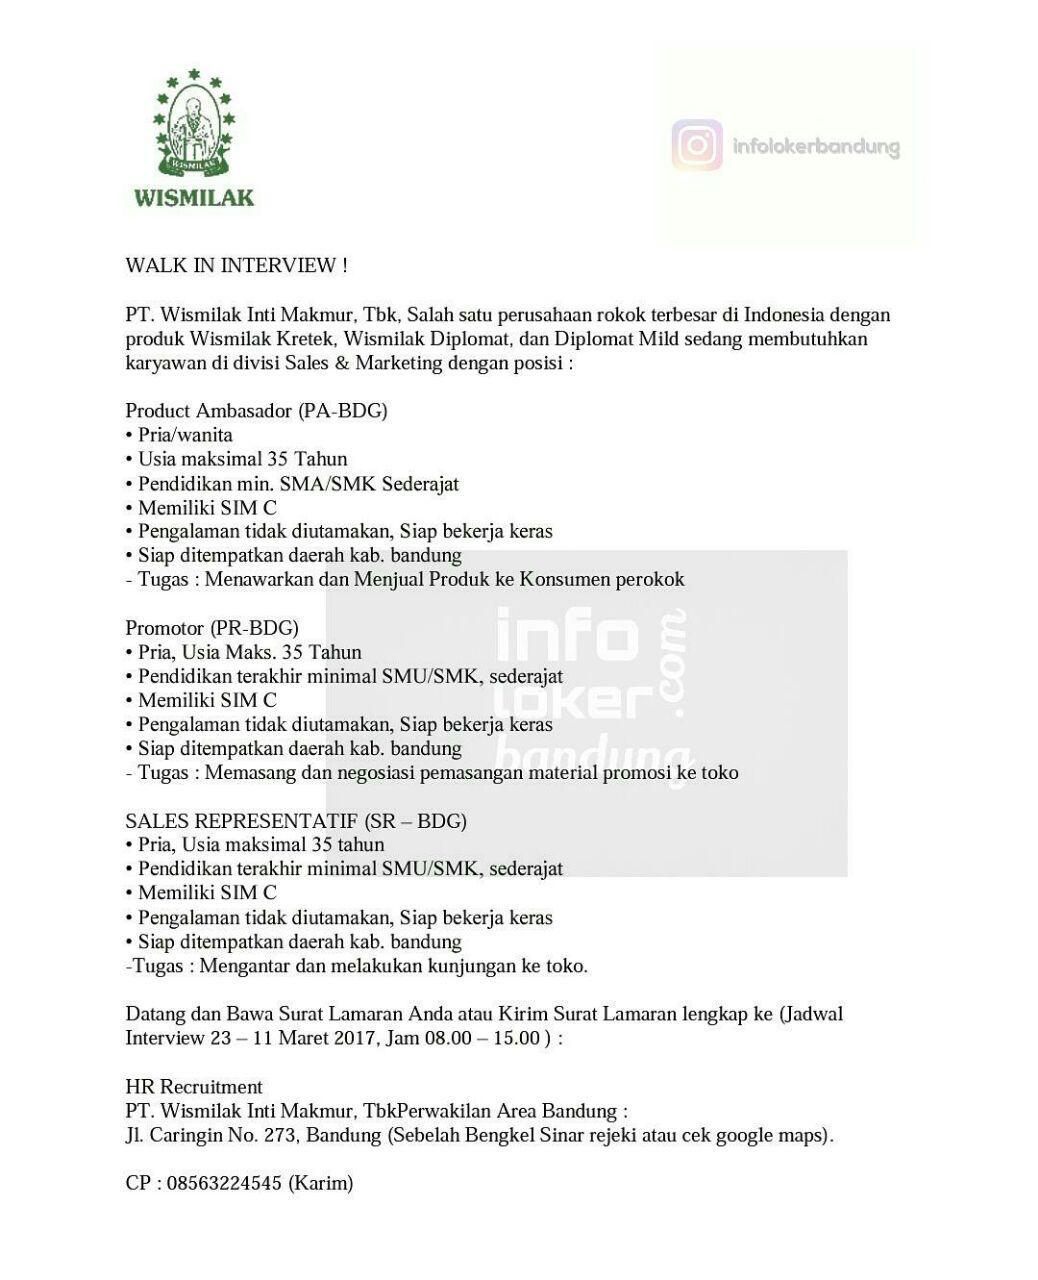 Lowongan Kerja PT. Wismilak Inti Makmur Tbk Bandung Februari 2017